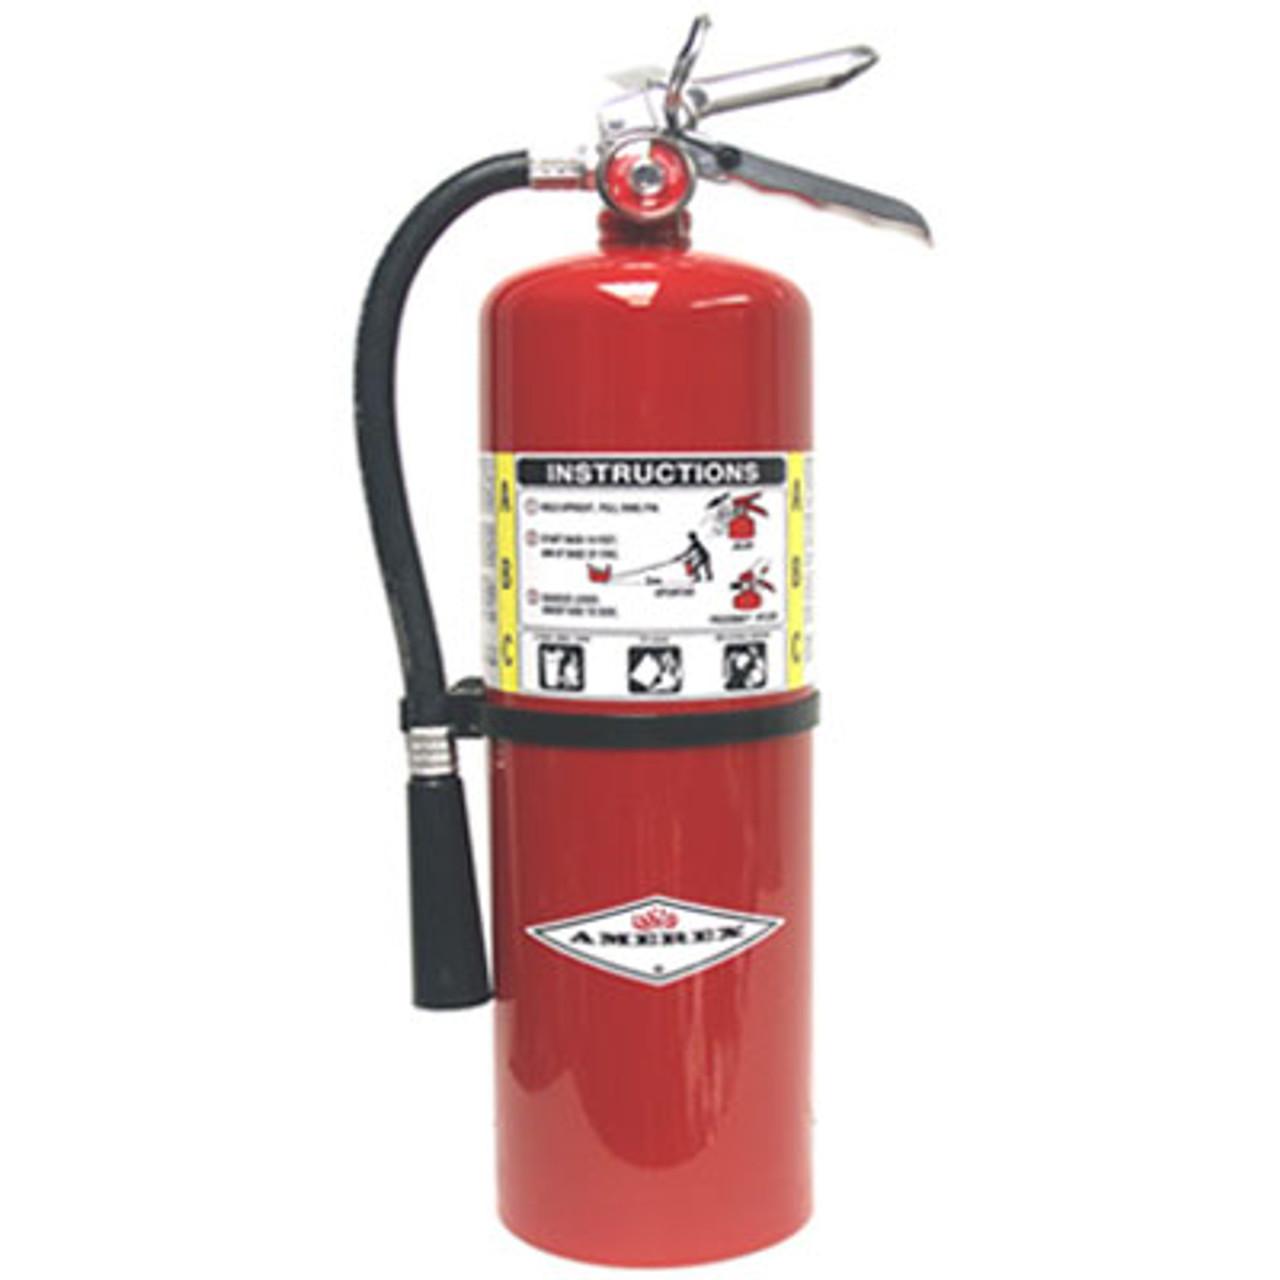 Amerex B423 - 20 lb ABC Extinguisher with Chrome Valve